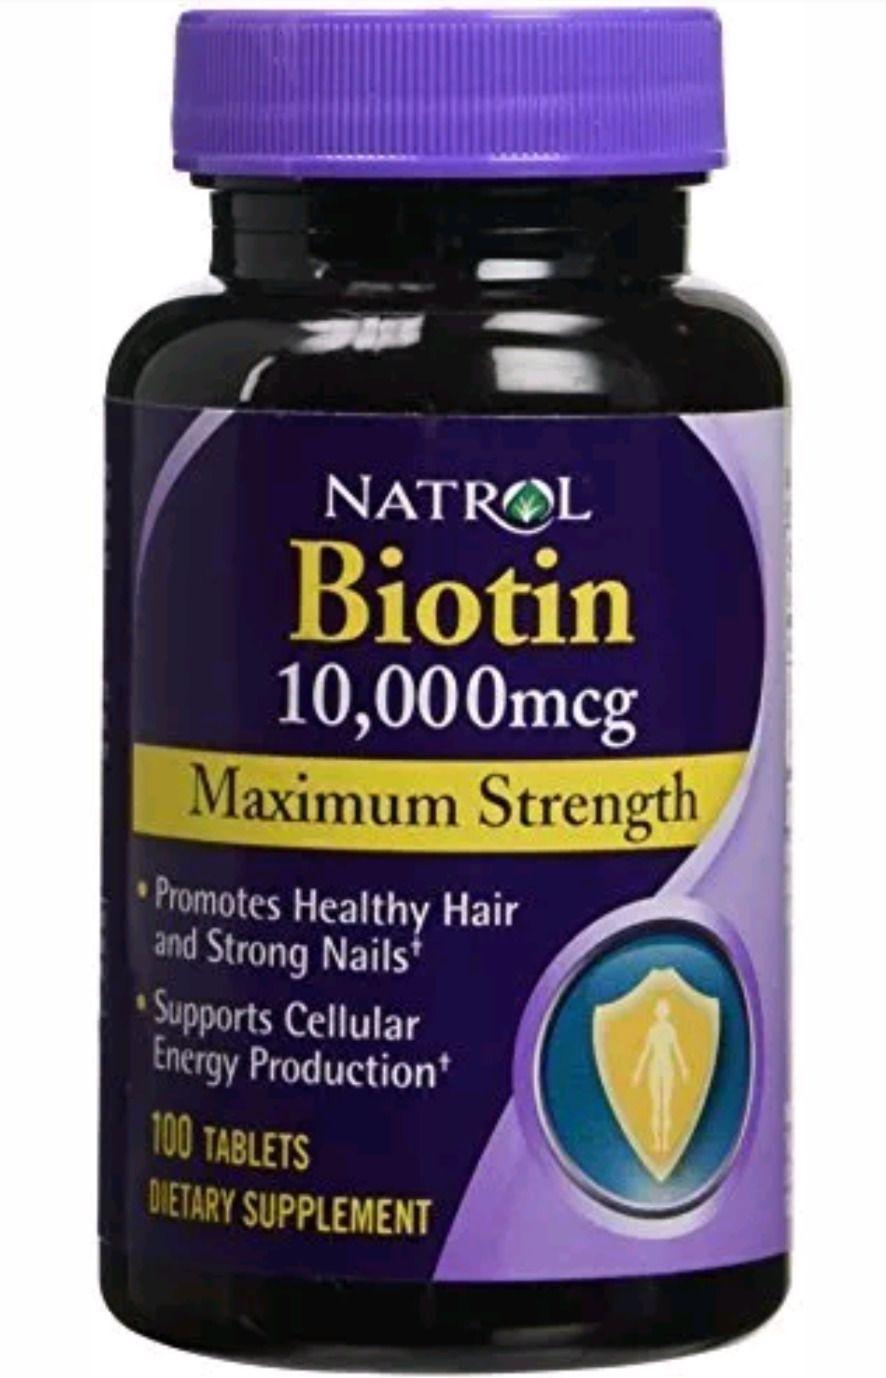 Natrol Vitamins Supplements Health Beauty Biotin Hair